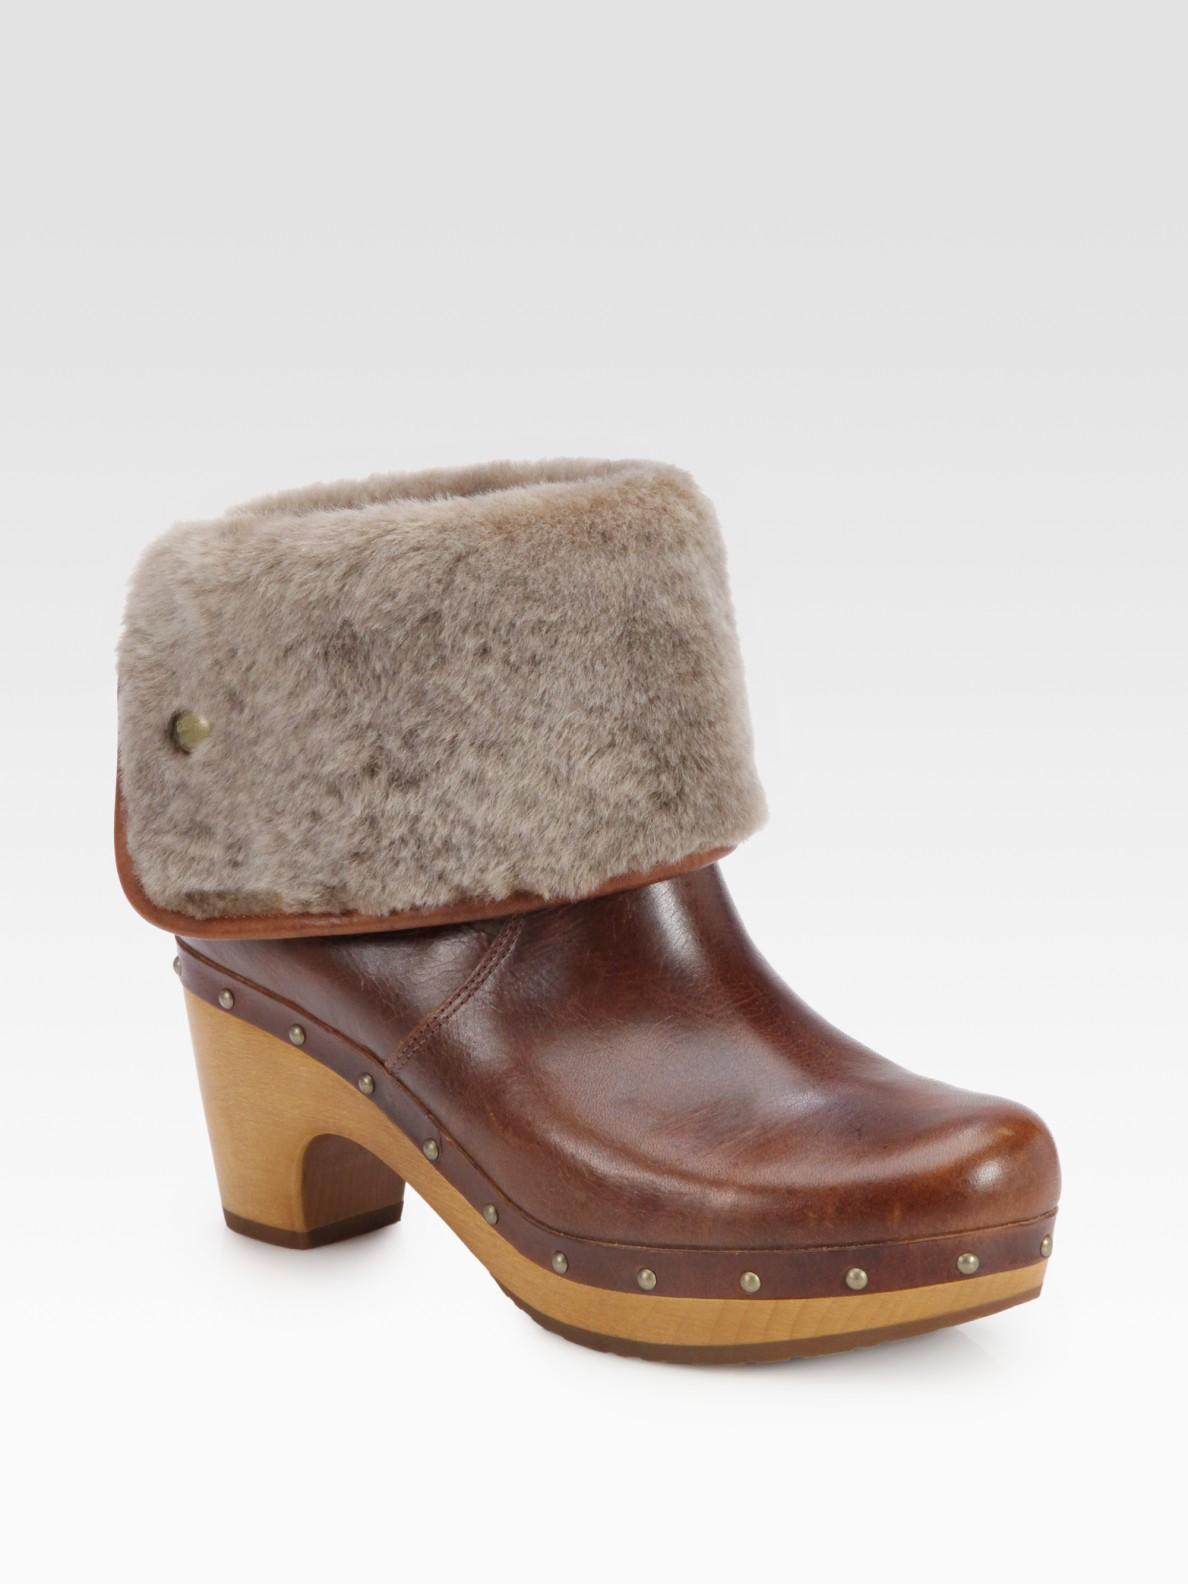 ugg boots uk stockists london